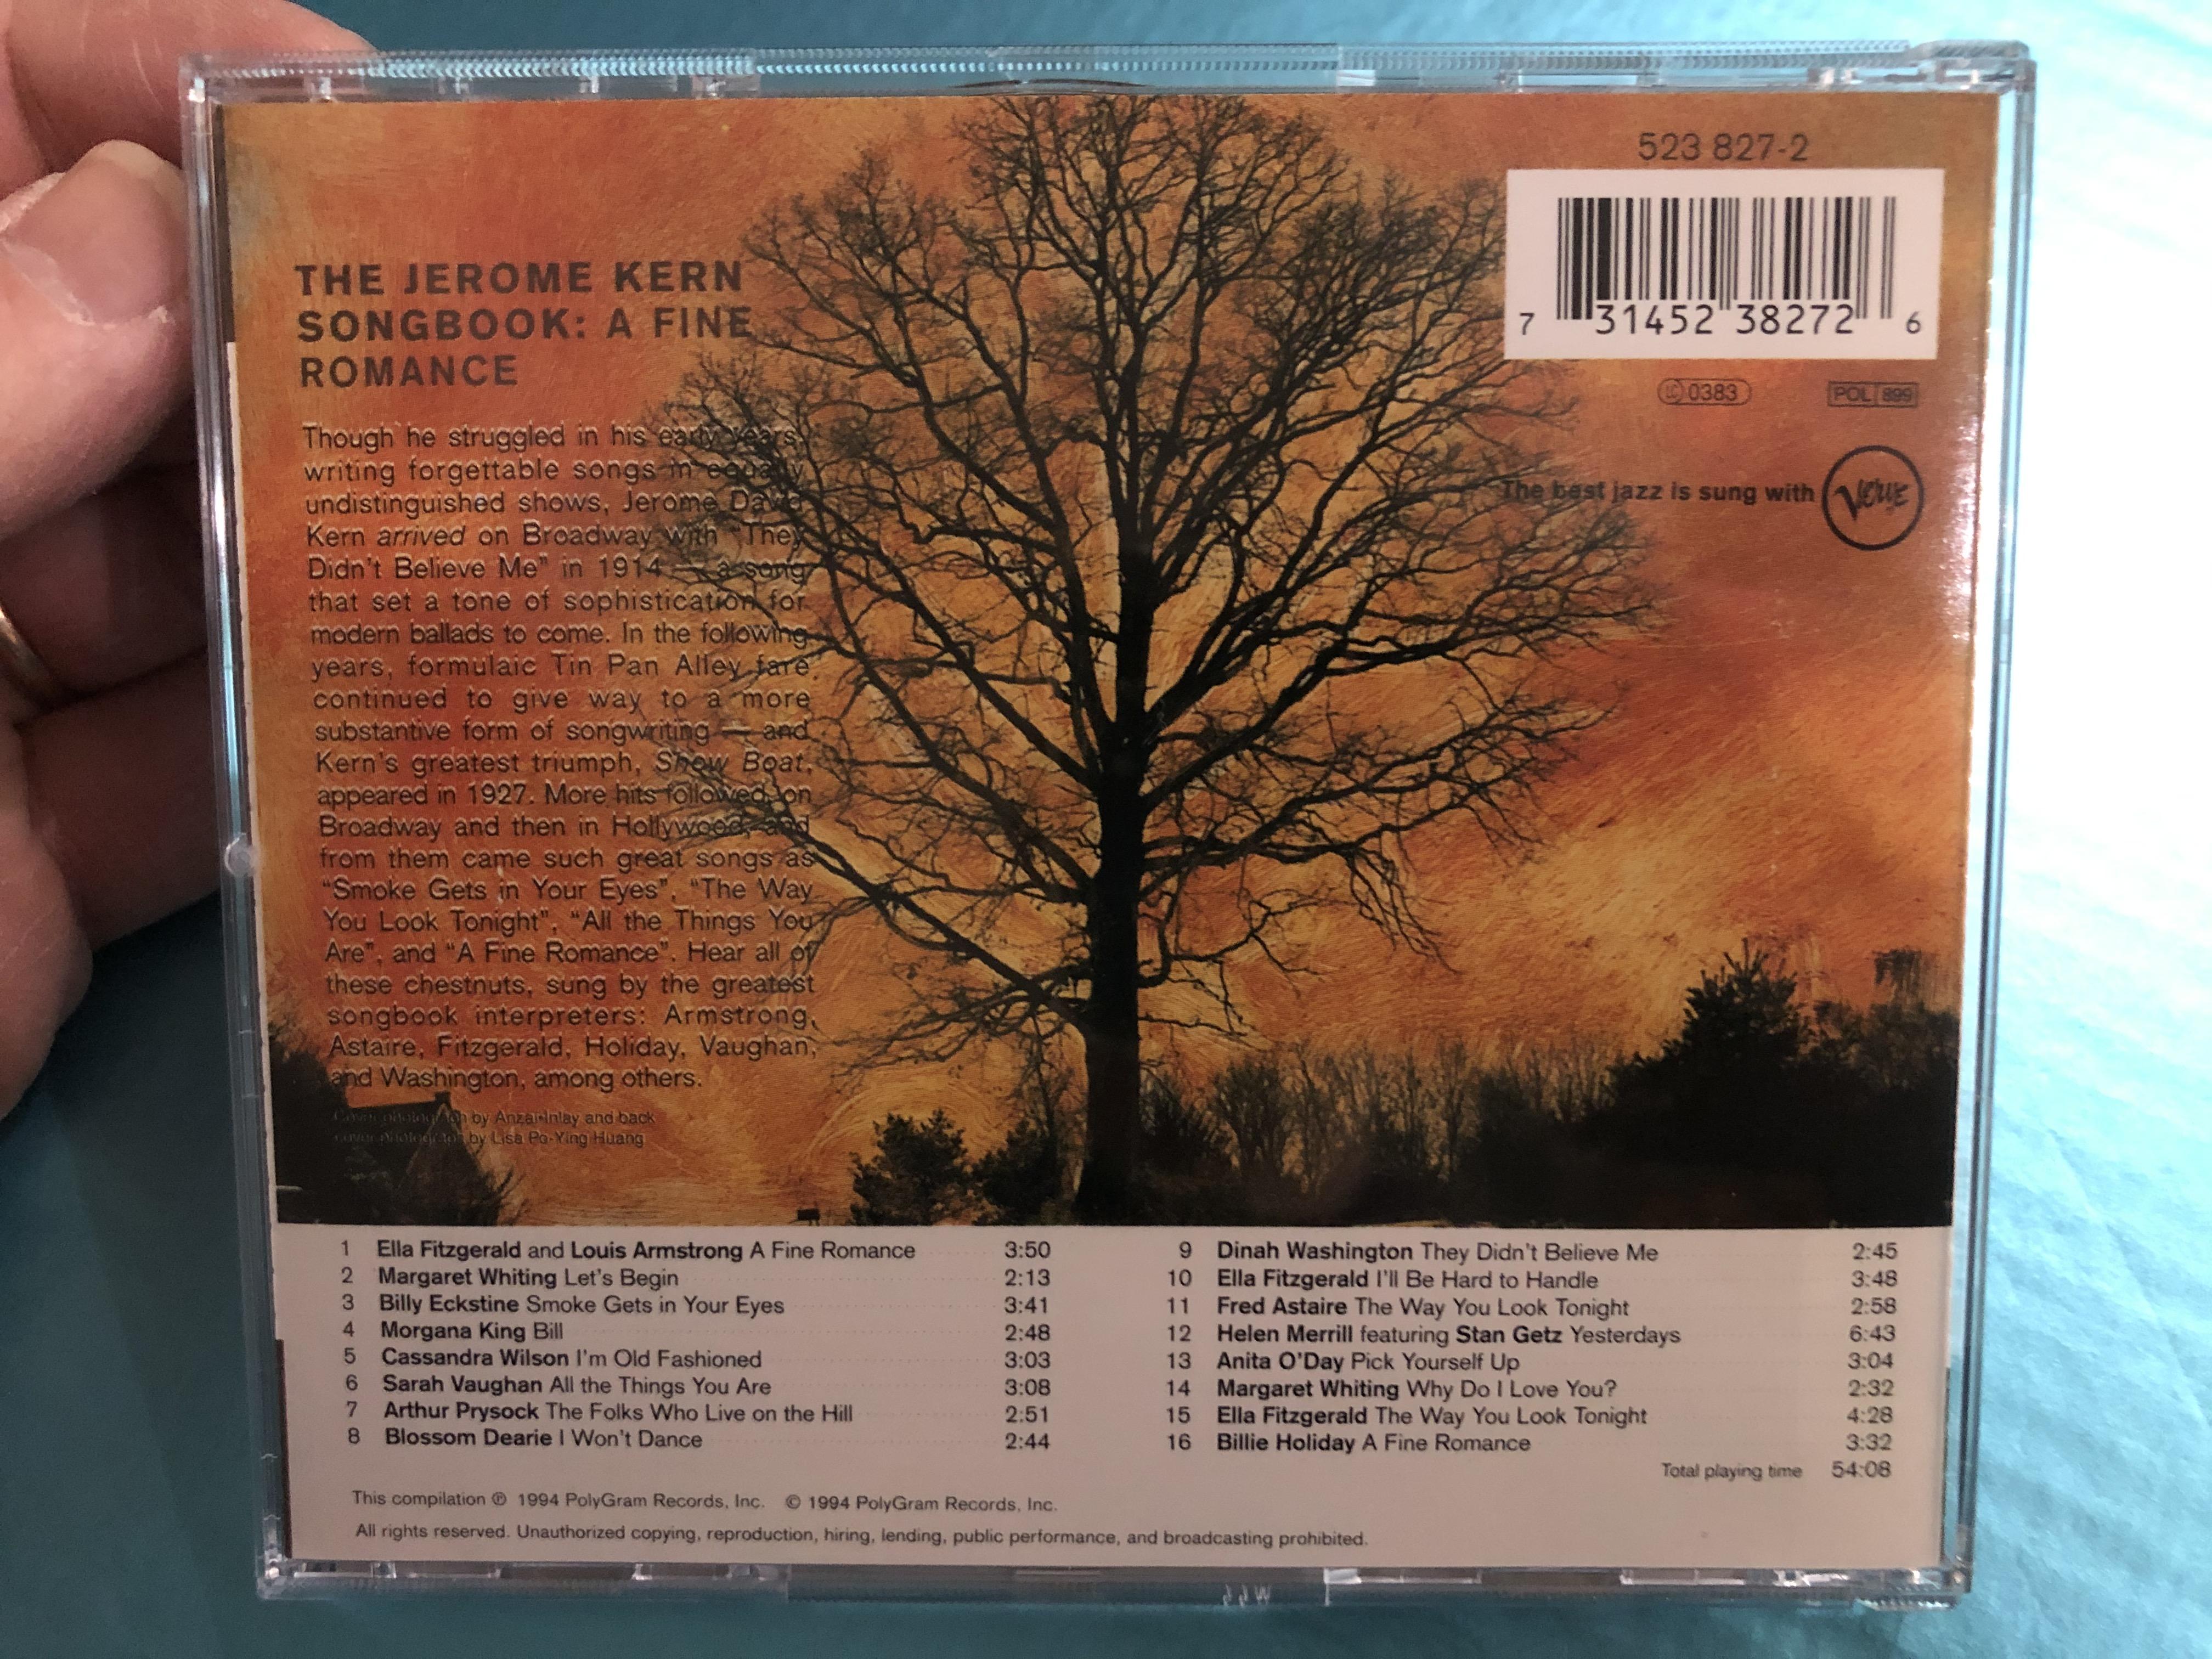 a-fine-romance-the-jerome-kern-songbook-verve-records-audio-cd-1994-523-827-2-2-.jpg